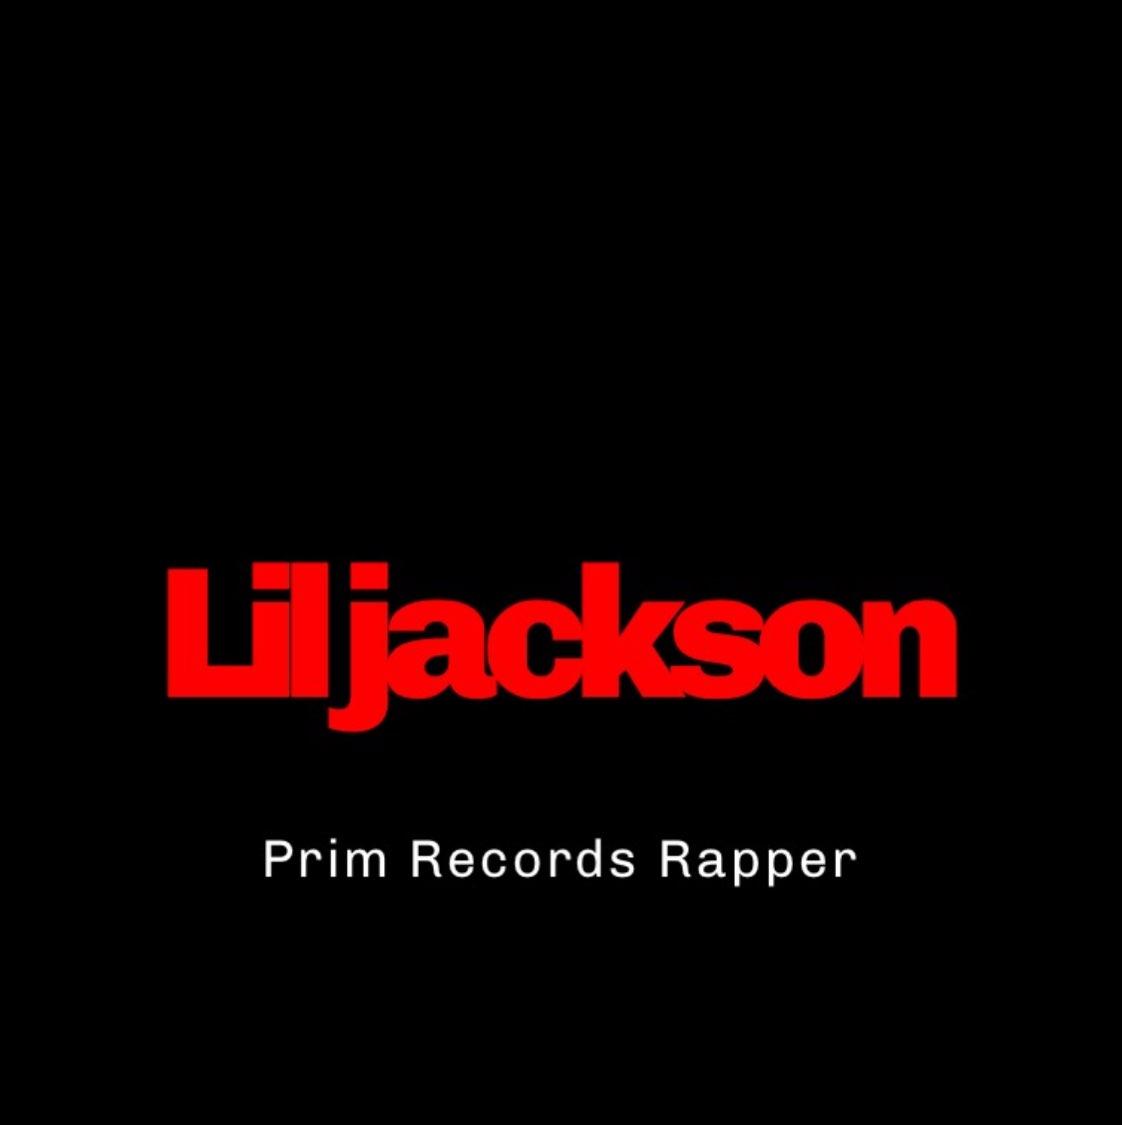 lil jackson